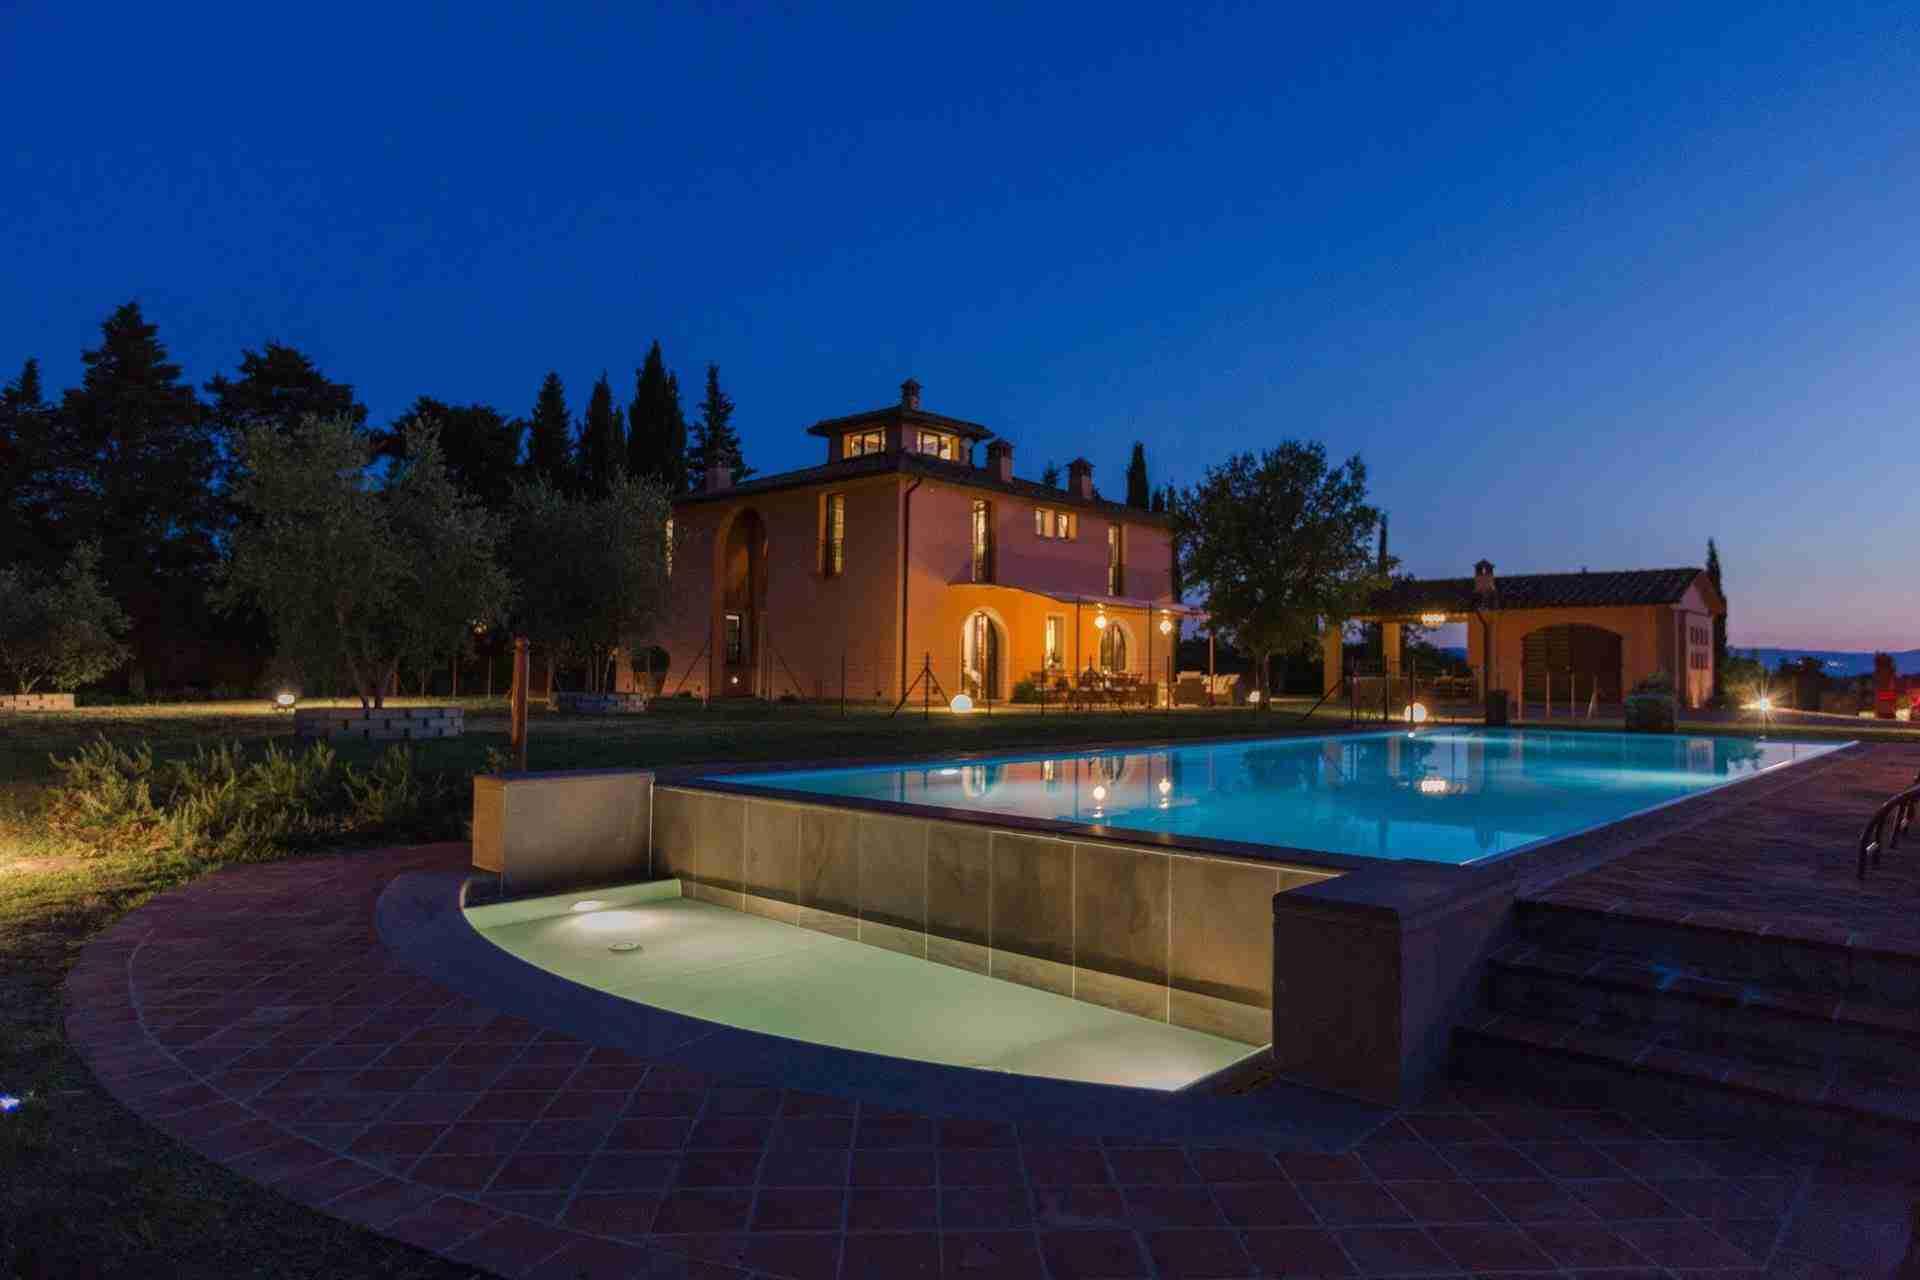 28 Dante night pool